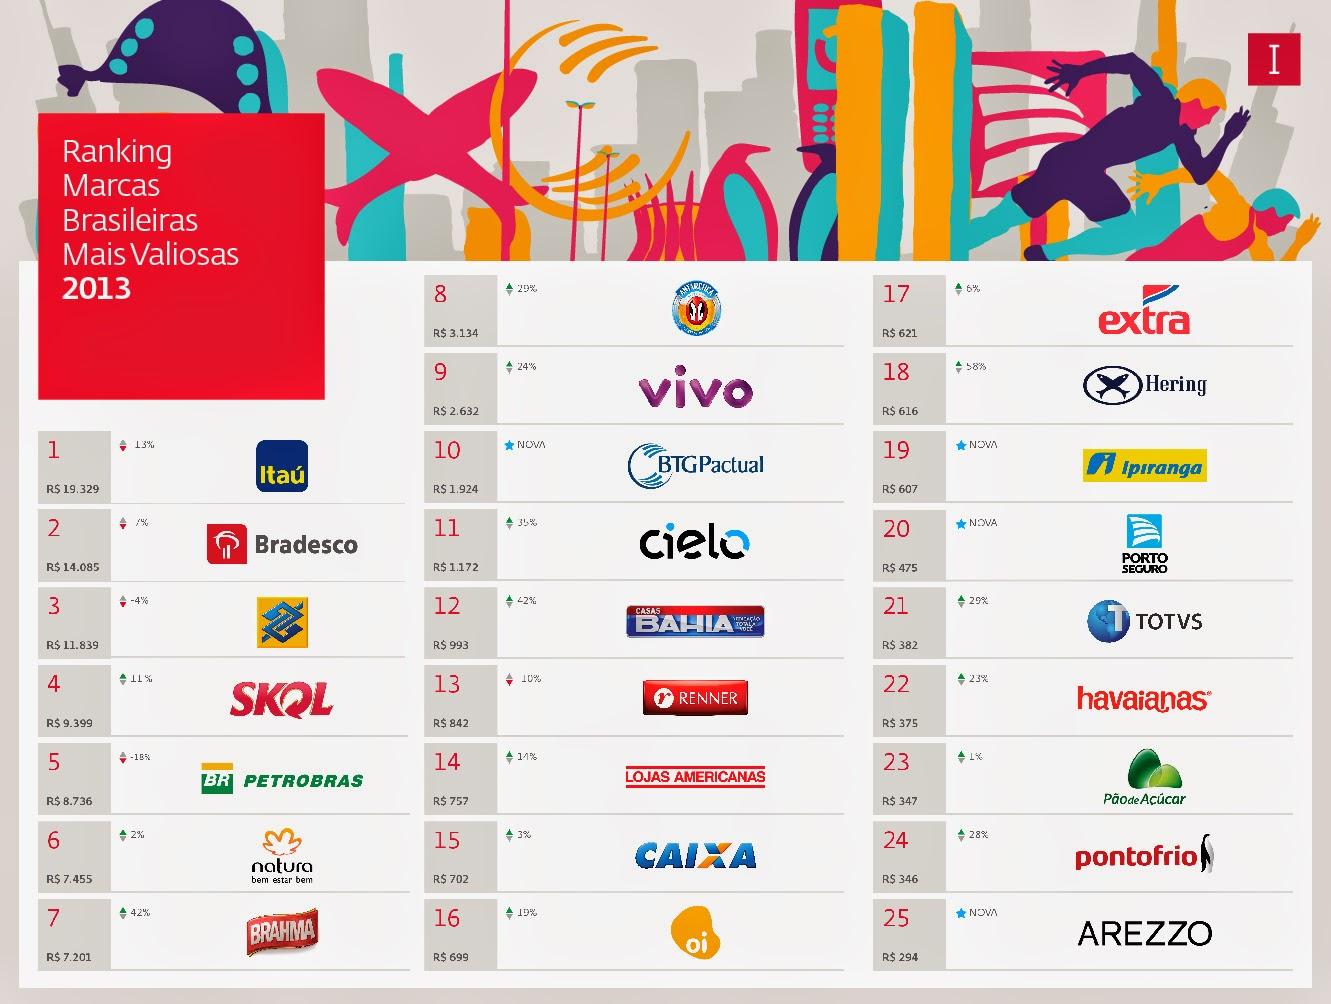 b7c2d216ec As marcas mais valiosas do Brasil, segundo a Interbrand : 1- Itaú - R$ 19,0  bi 2- Bradesco - R$ 14,0 bi 3- Banco do Brasil - R$ 11,8 bi 4- Skol - R$  9,4 bi